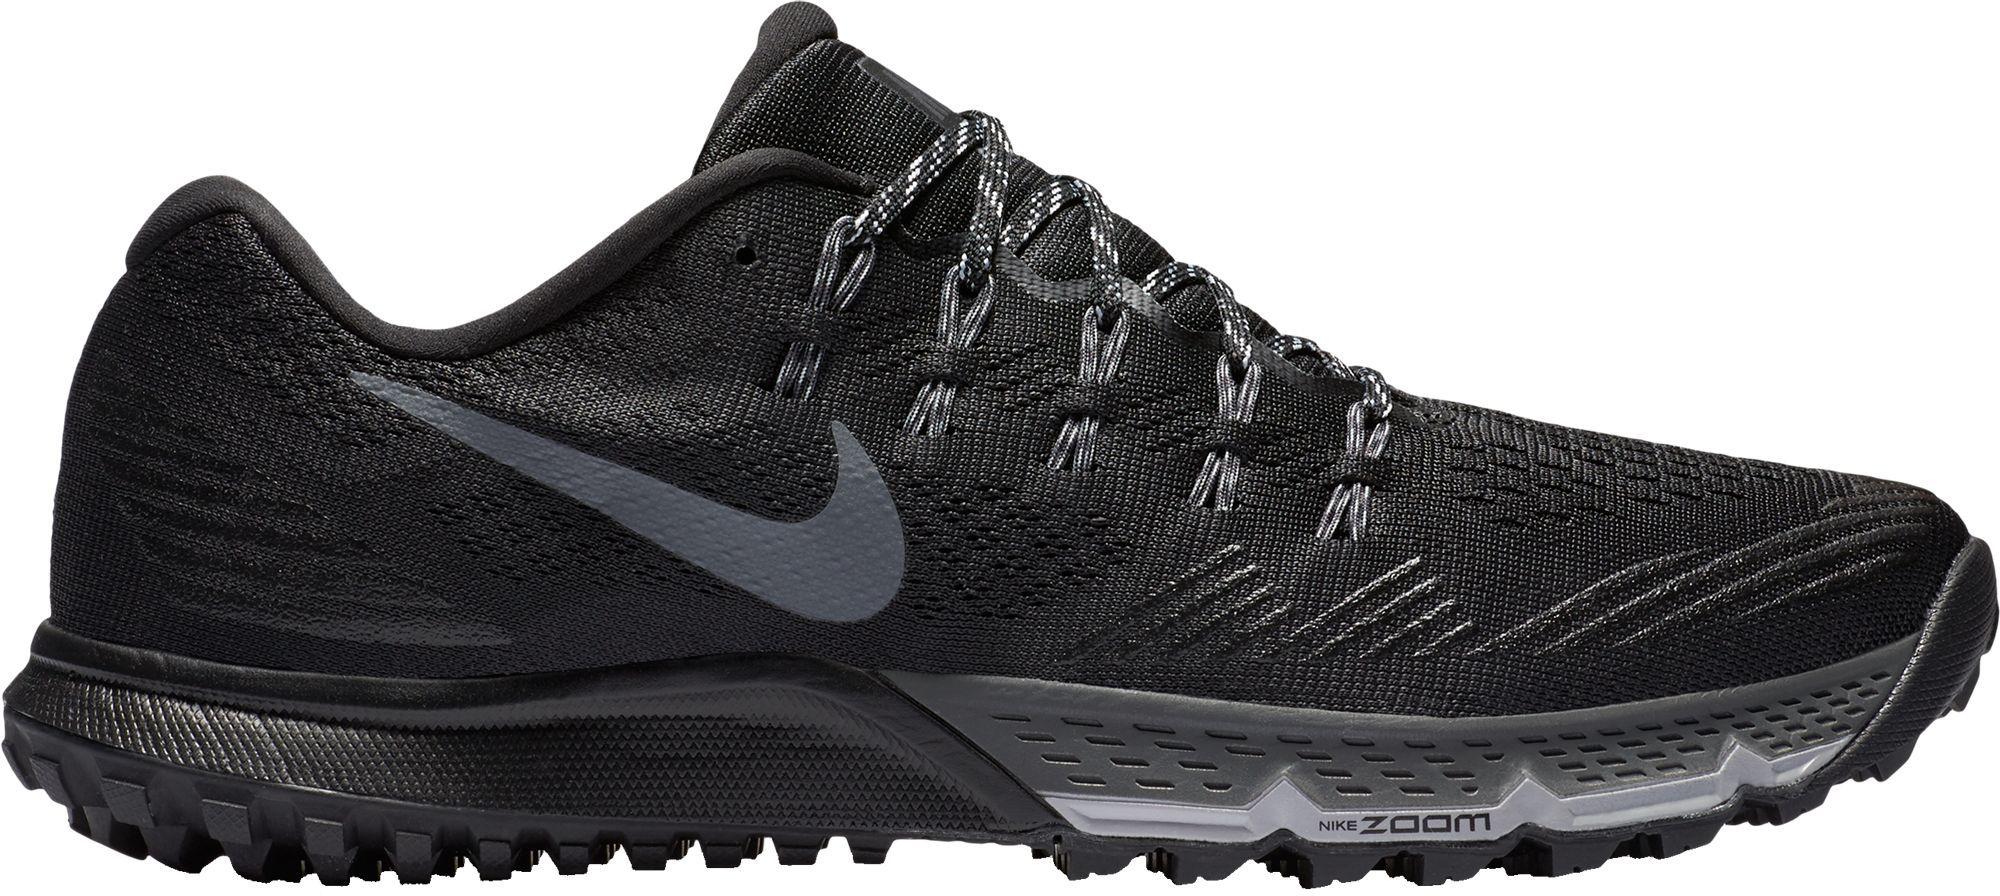 c6ba1ff553f Nike Men s Zoom Terra Kiger 3 Trail Running Shoes